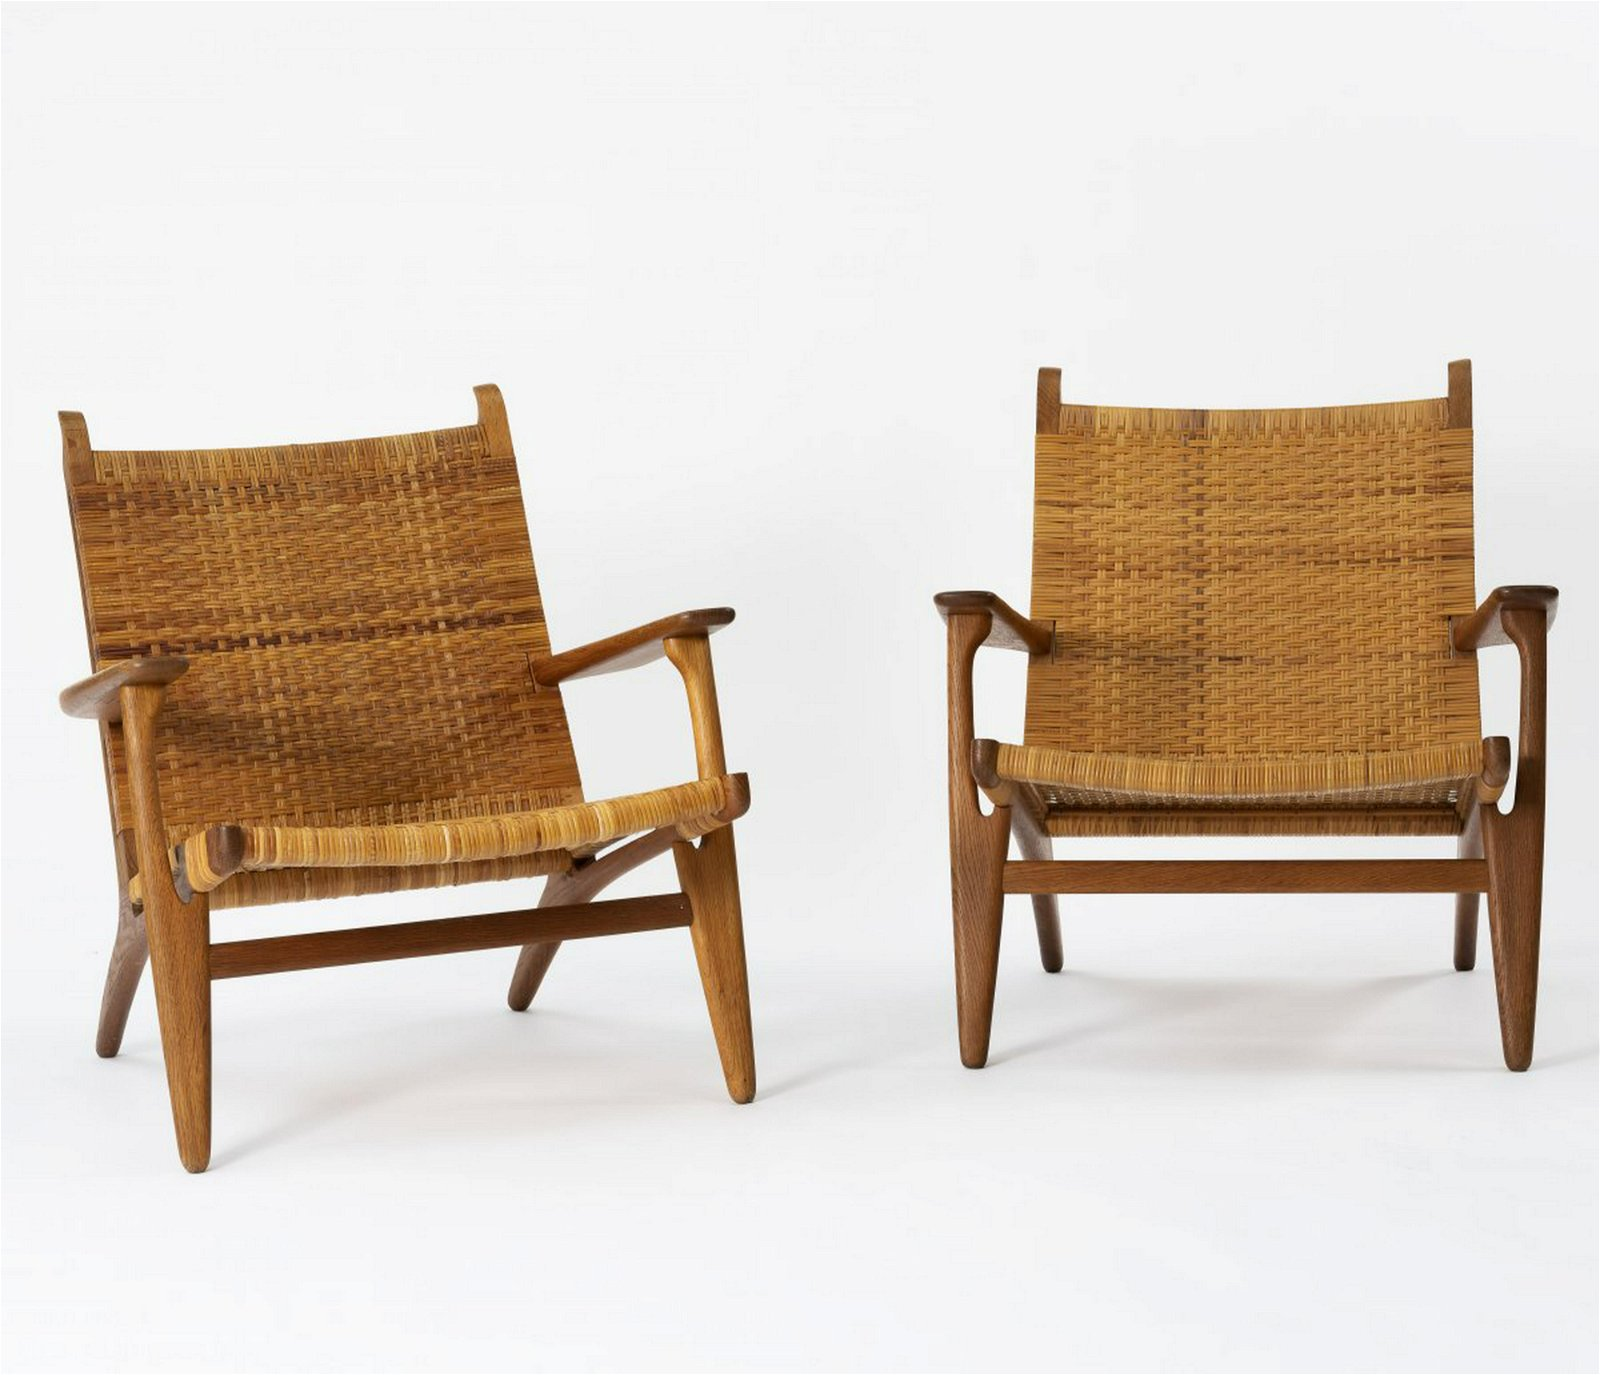 Hans J. Wegner, Two 'CH 27' armchairs, 1949